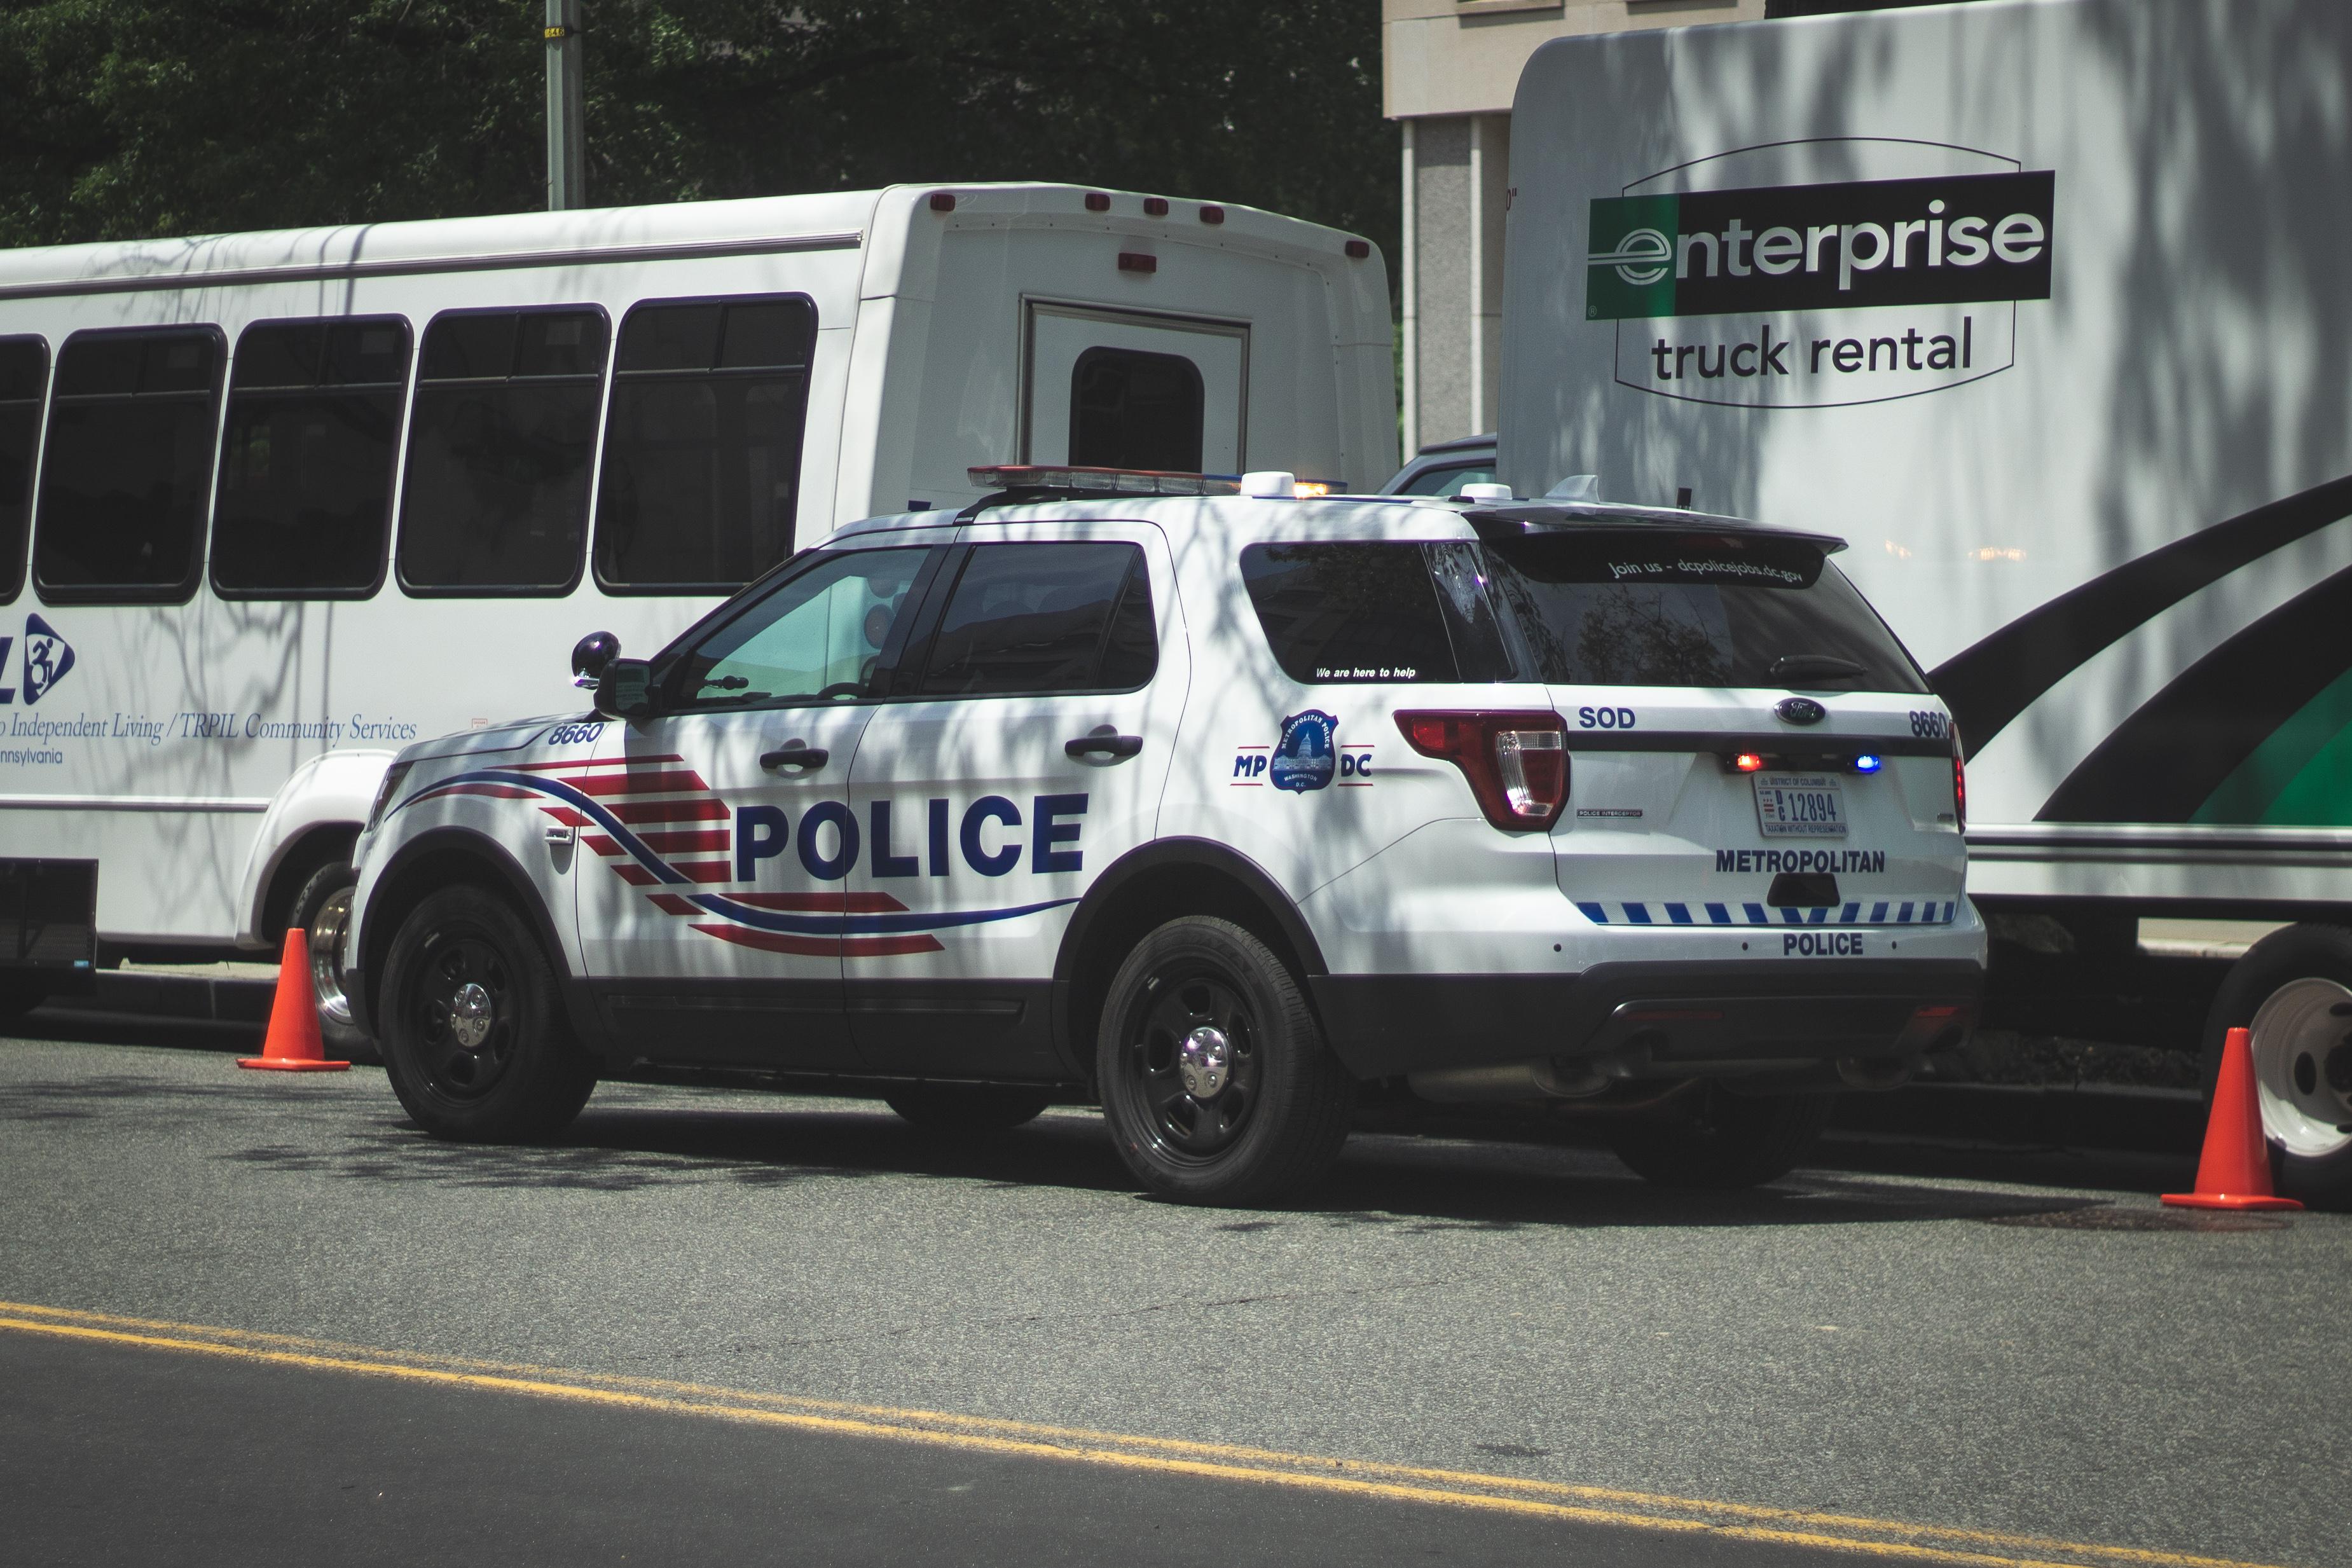 Washington, DC Metropolitan Police - Ford Utility, Building, Police car, Washington DC Police, Washington, HQ Photo